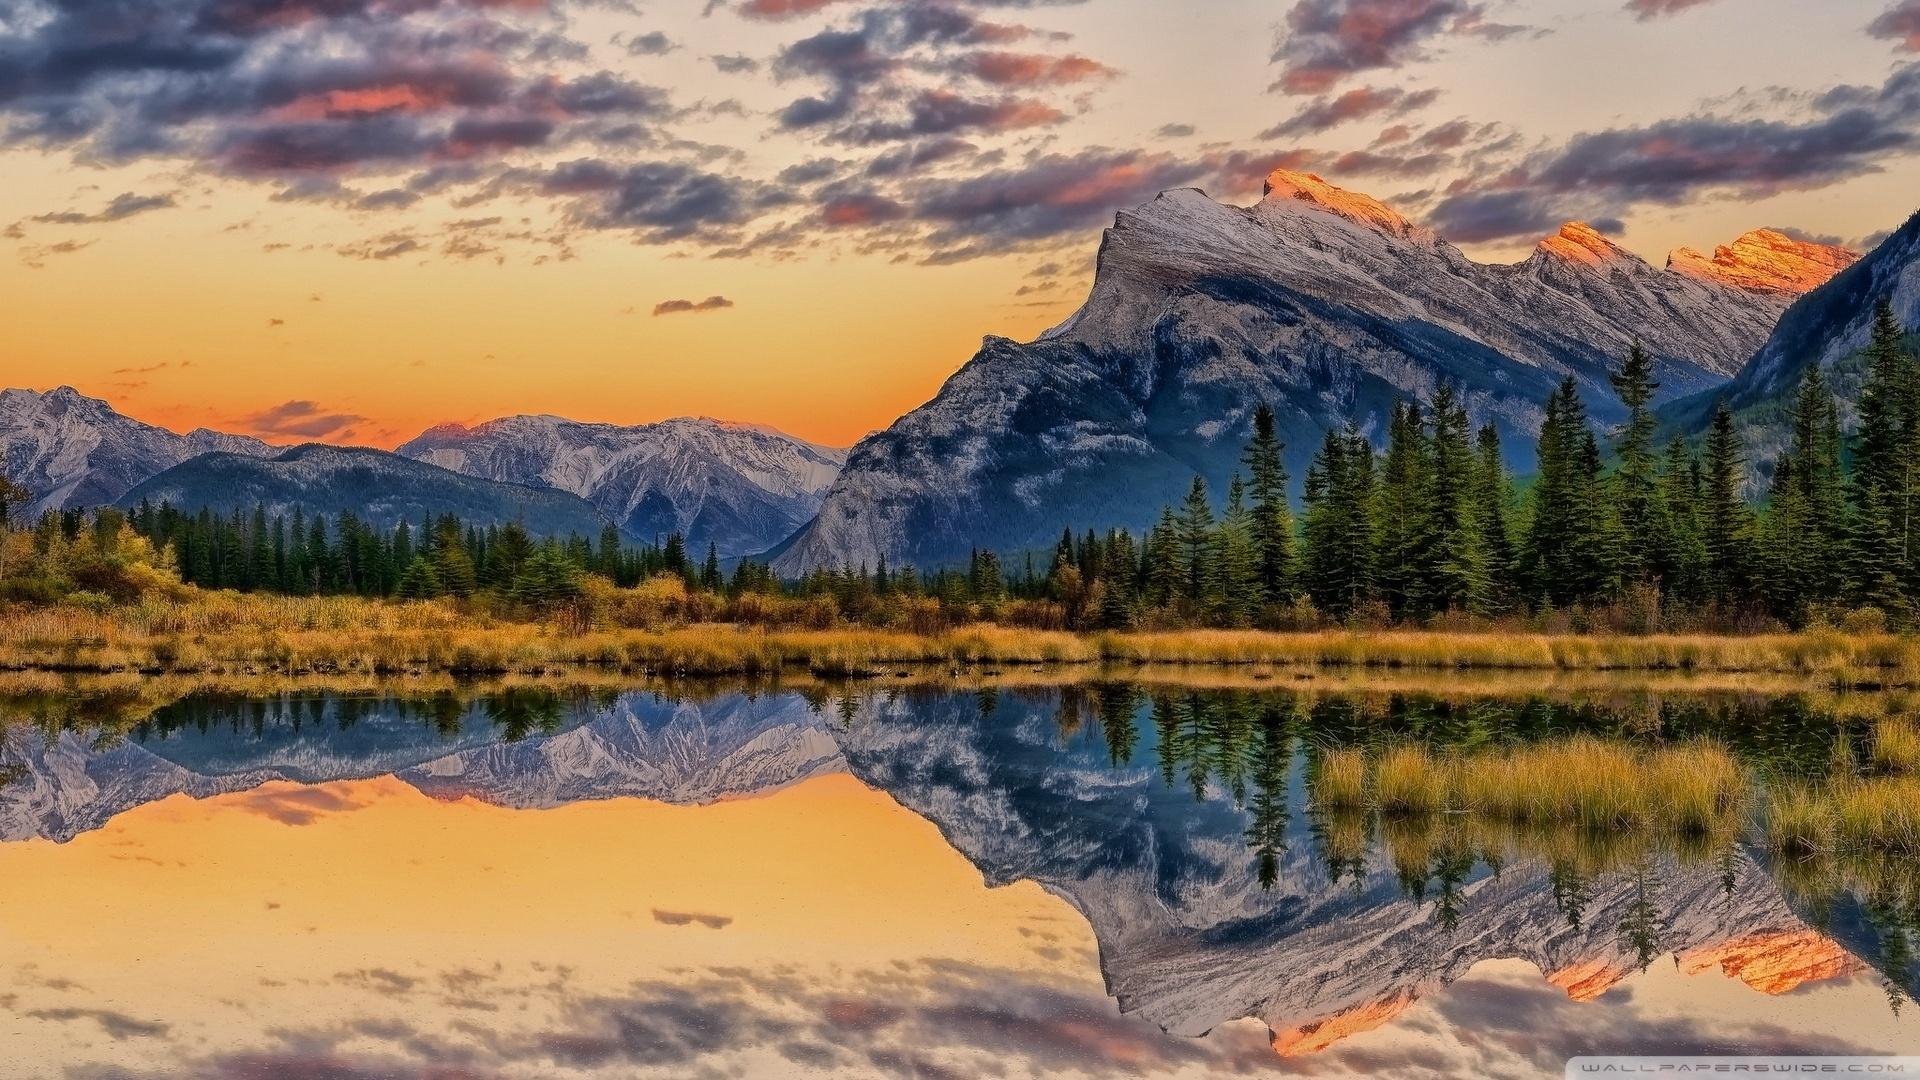 breathtaking nature ❤ 4k hd desktop wallpaper for 4k ultra hd tv